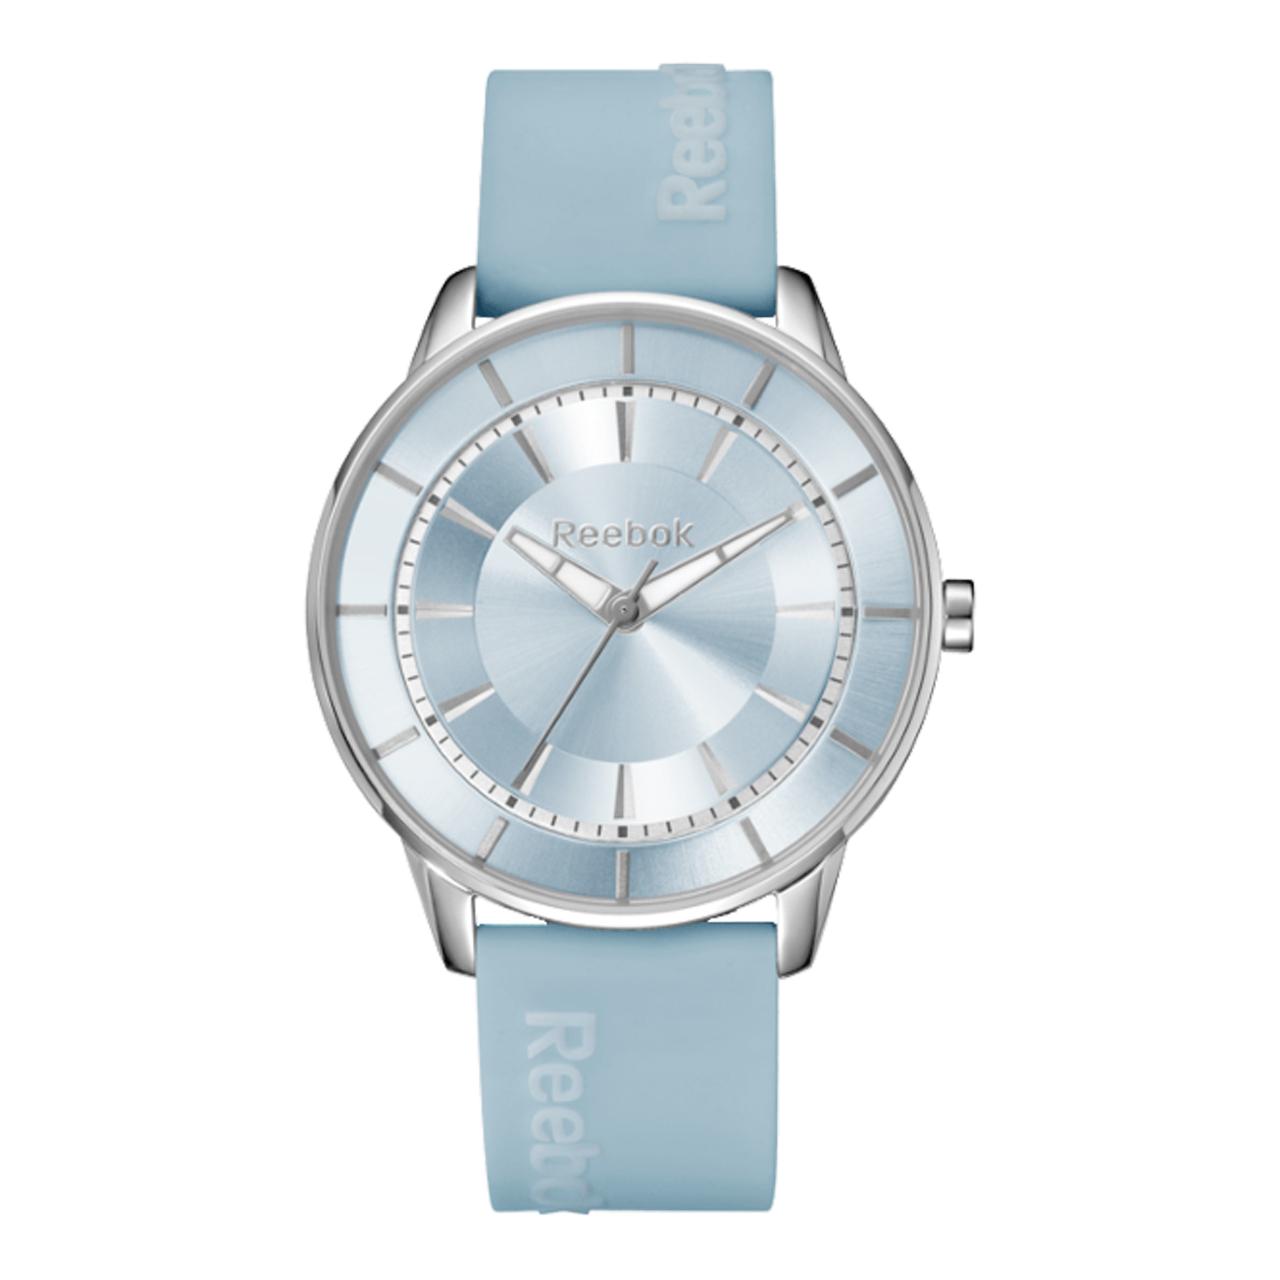 خرید ساعت مچی عقربه ای زنانه ریباک مدل RF-KAL-L2-S1IK-K1